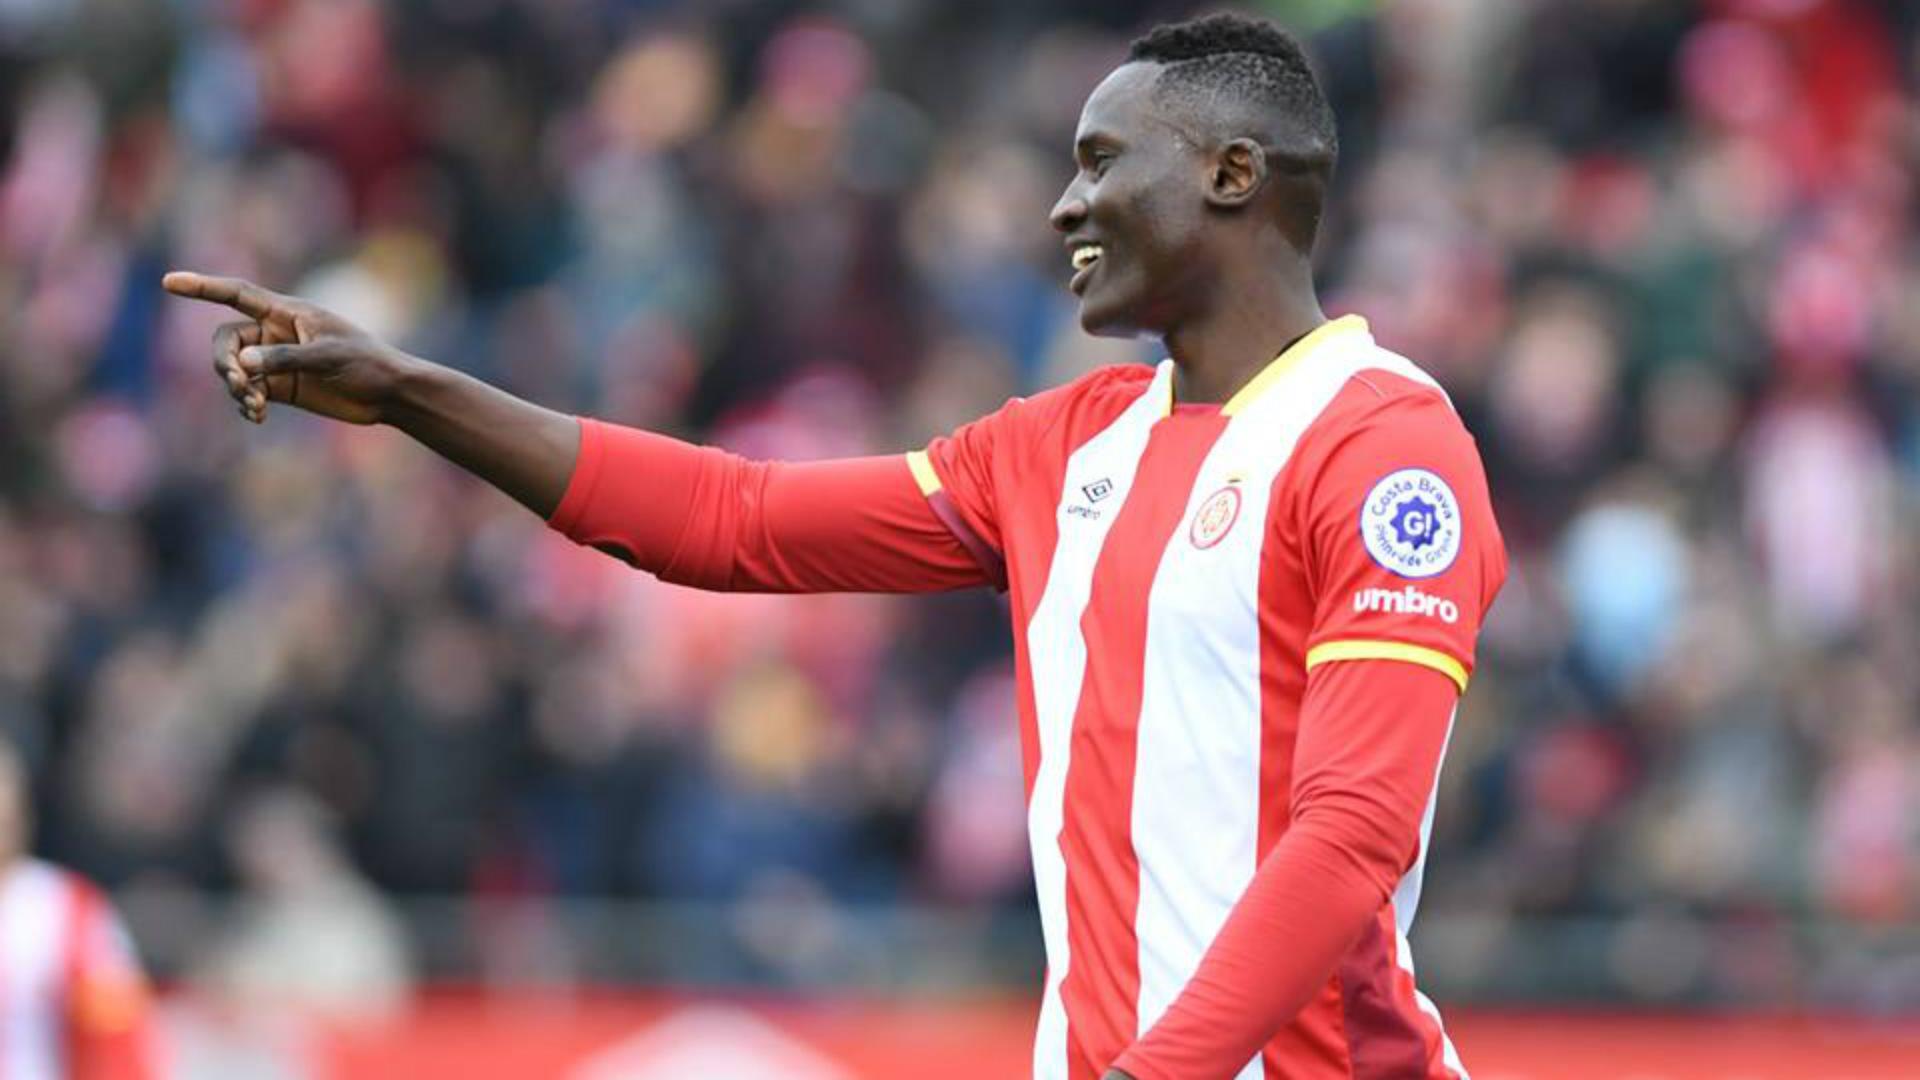 Kenyan sub Olunga scores hat-trick in Girona romp